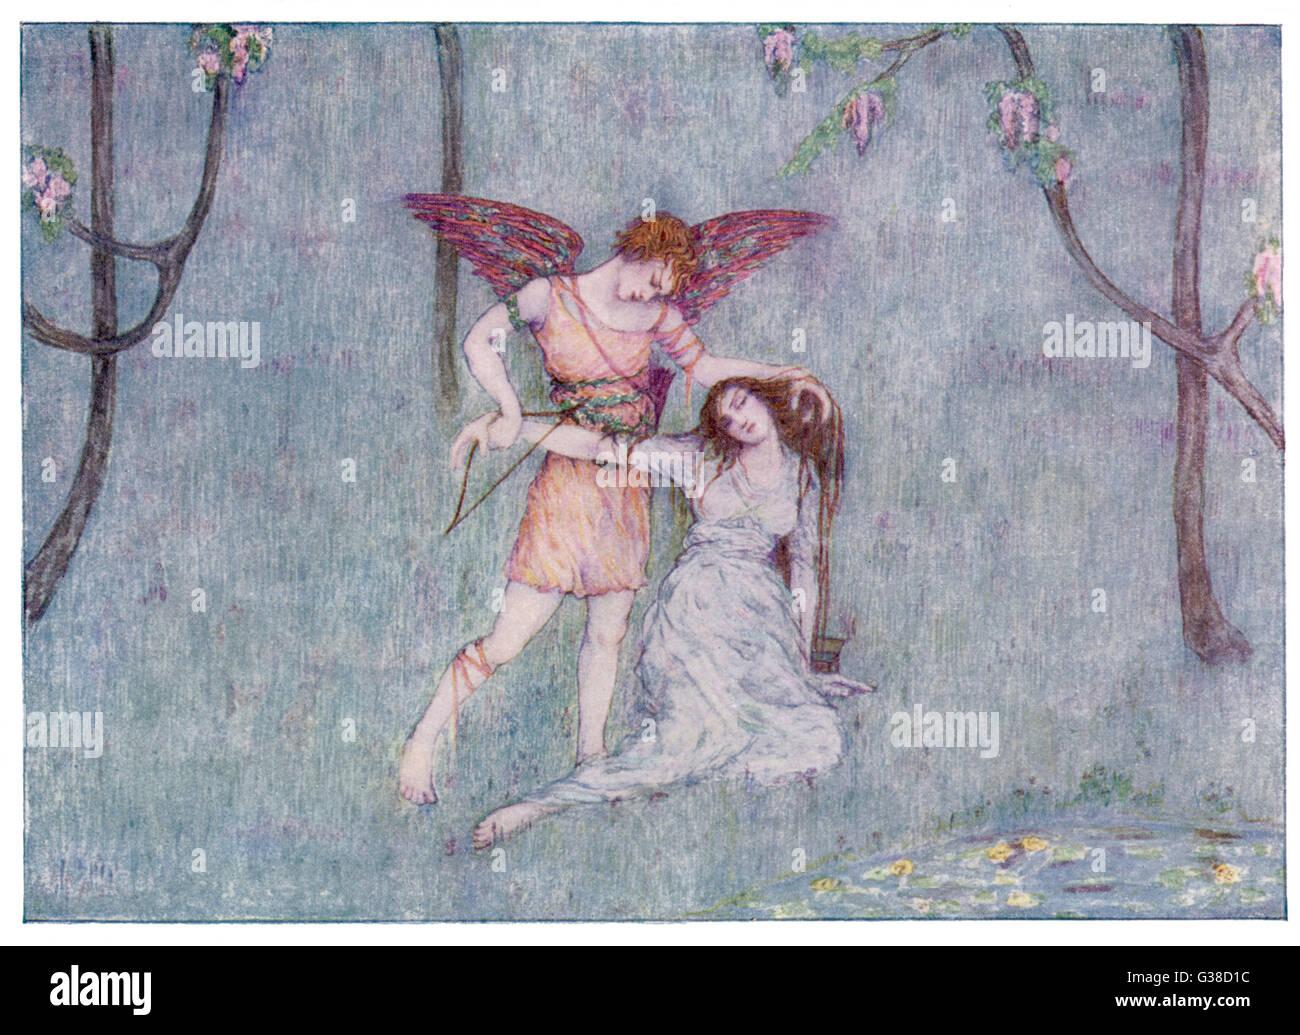 Eros/Cupid wakes Psyche         Date: 1914 - Stock Image